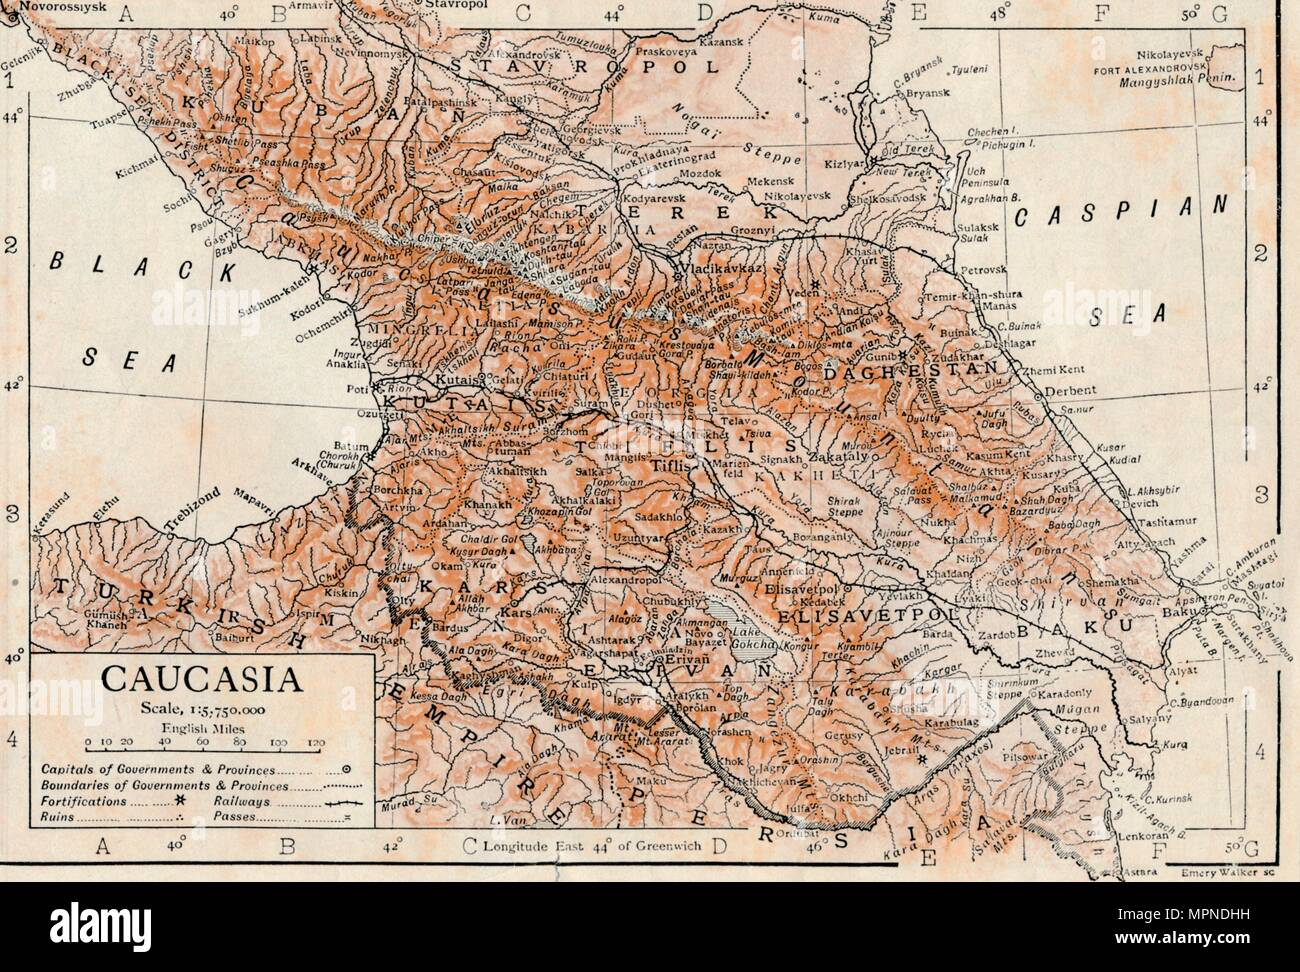 'Caucasia'. Artist: Unknown. - Stock Image